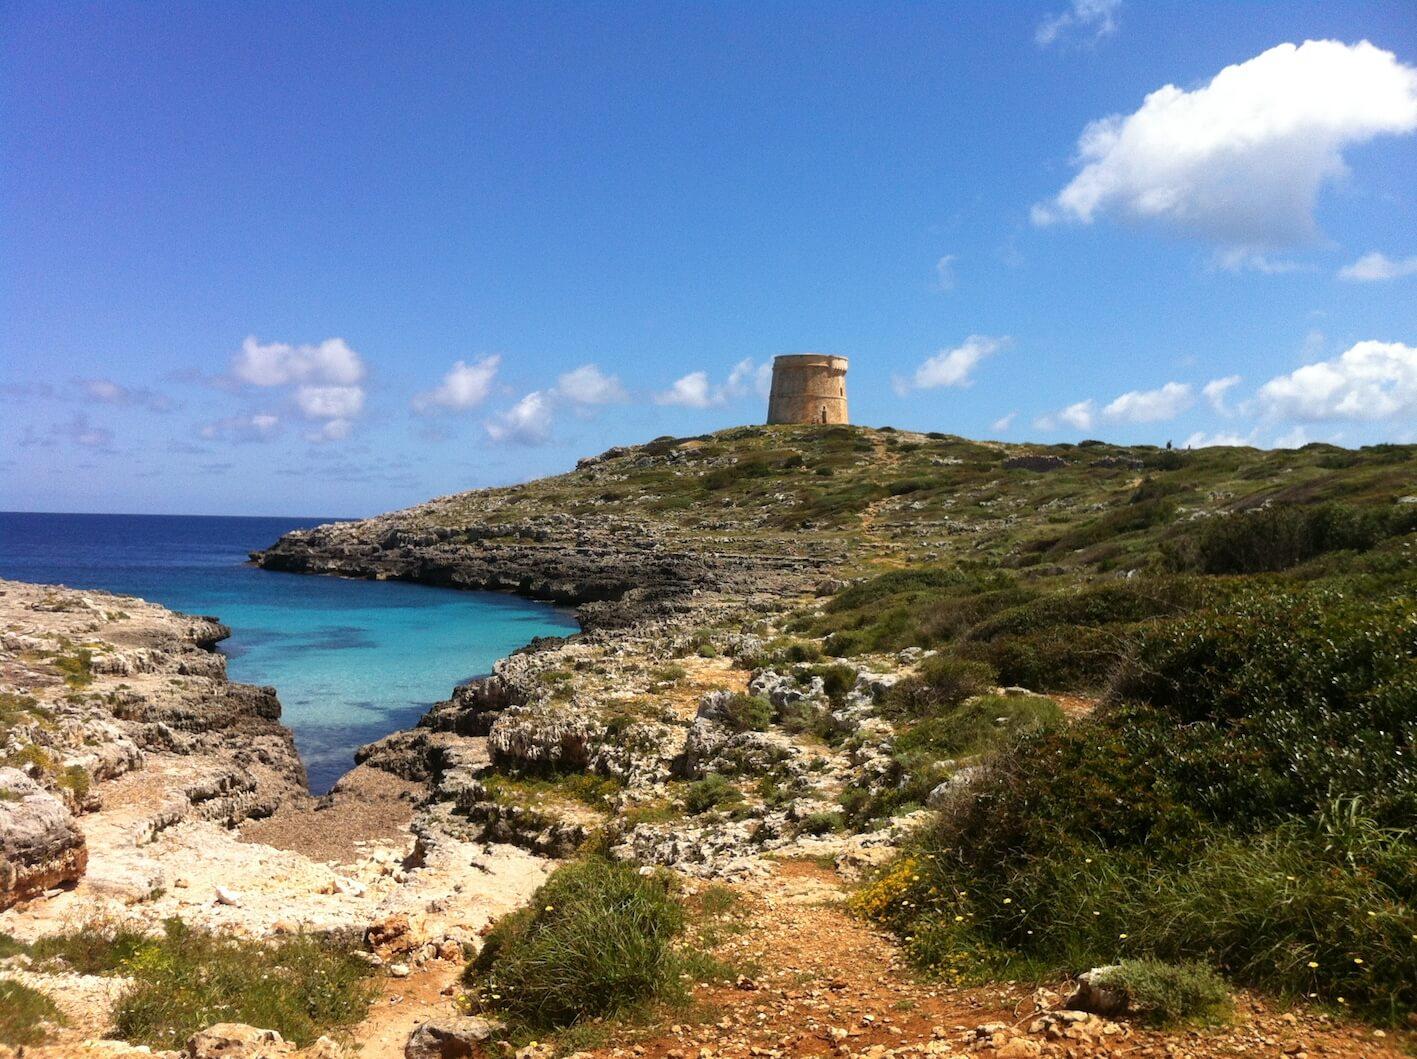 Cala Roja - The most romantic beaches of Menorca